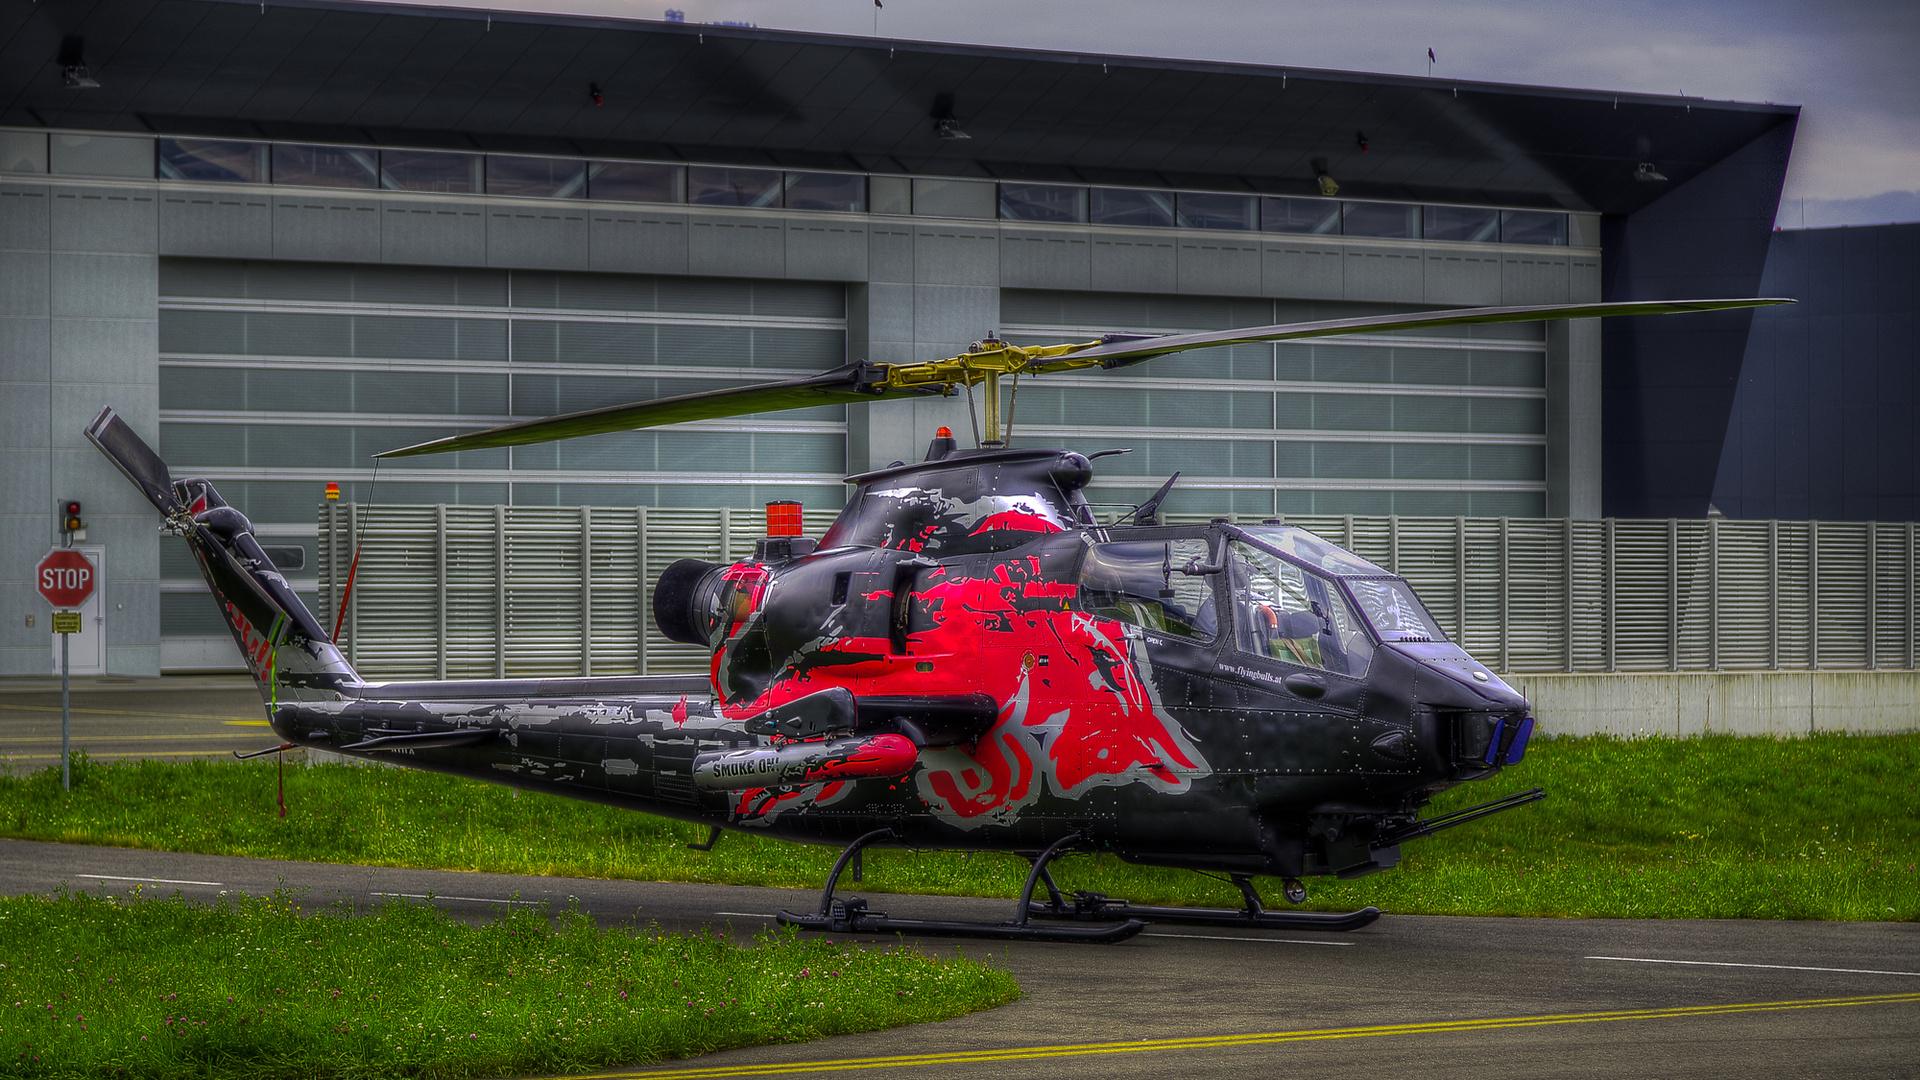 Bell AH-1 Cobra HDR